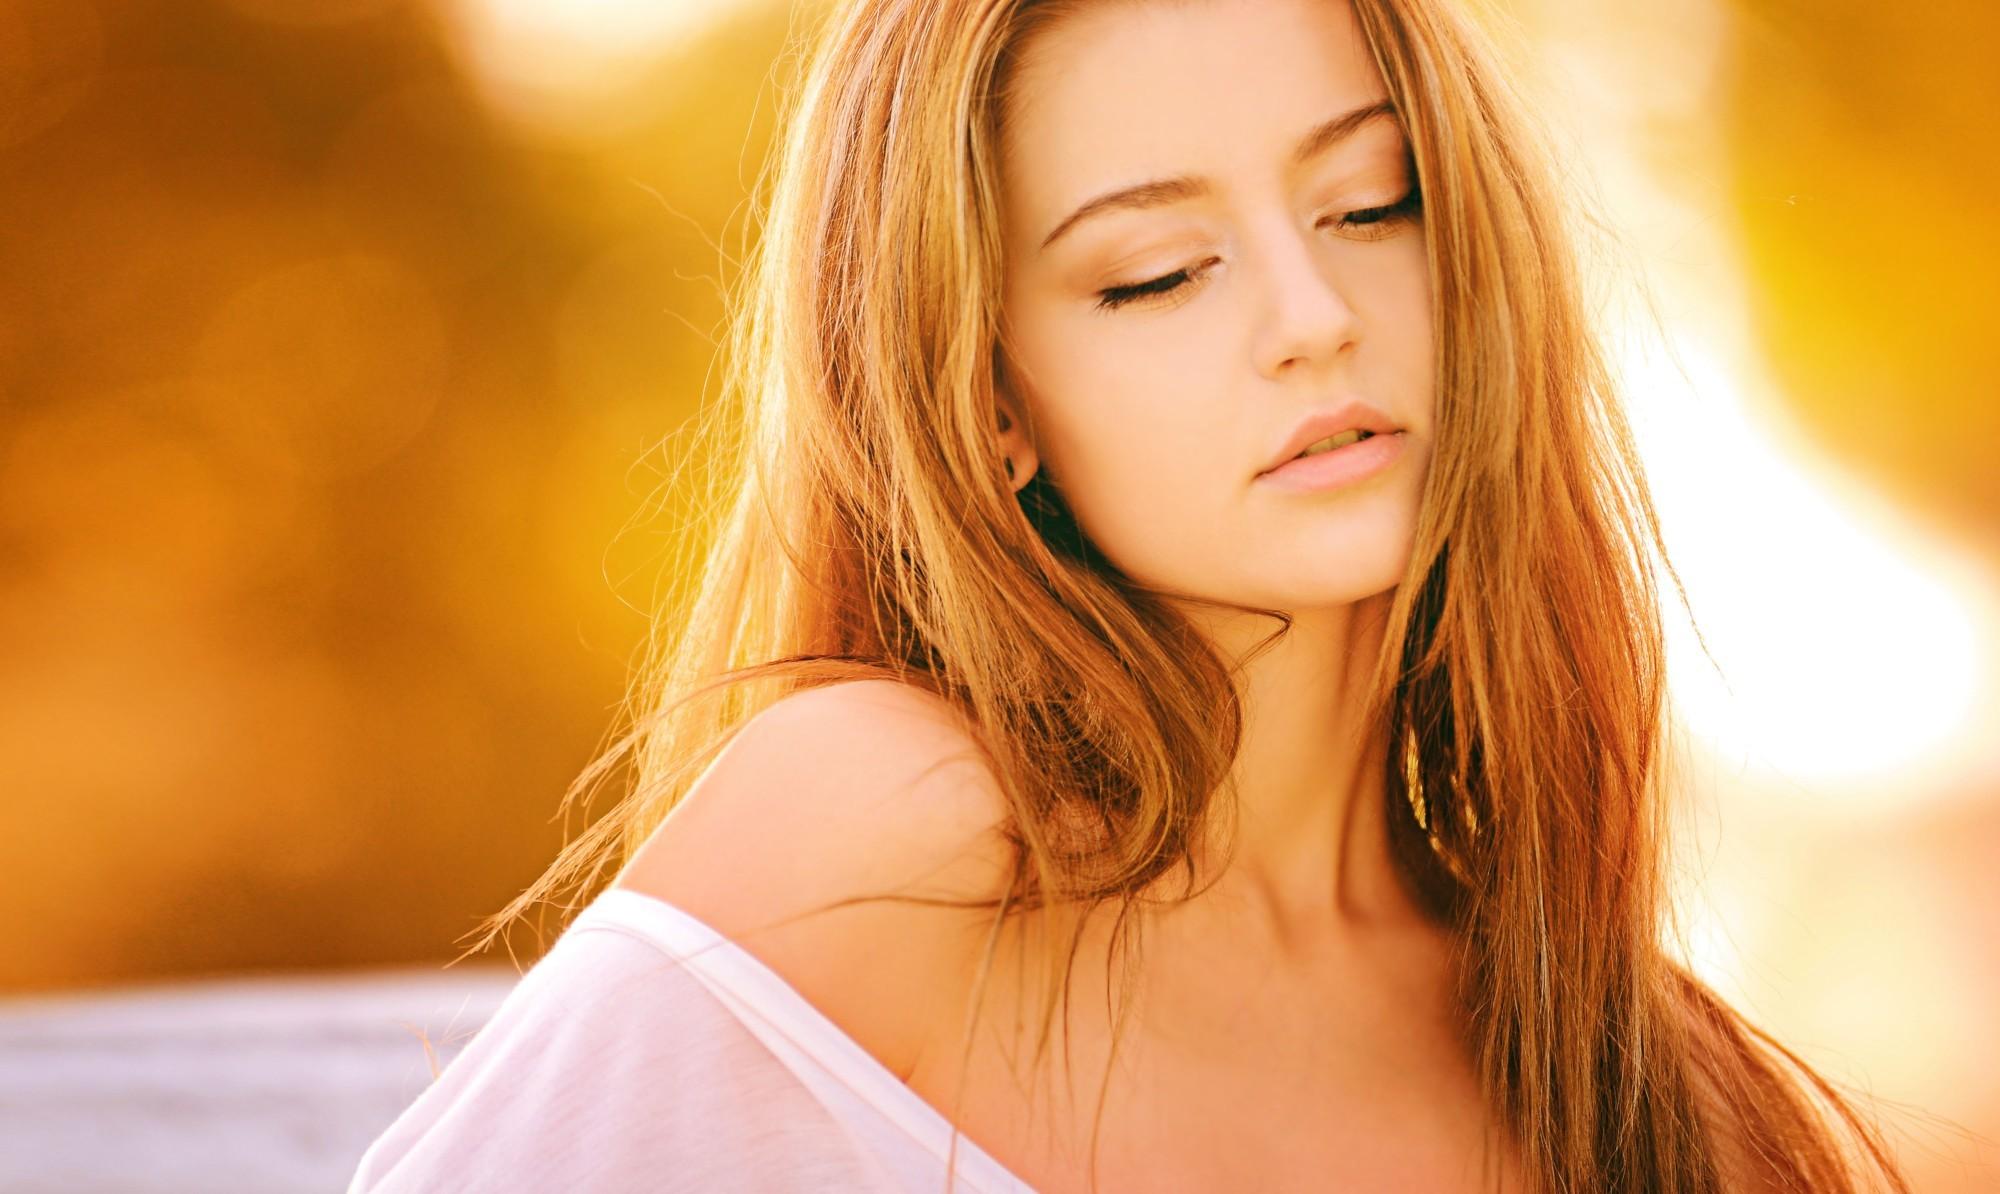 shampoo to pass a hair follicle test